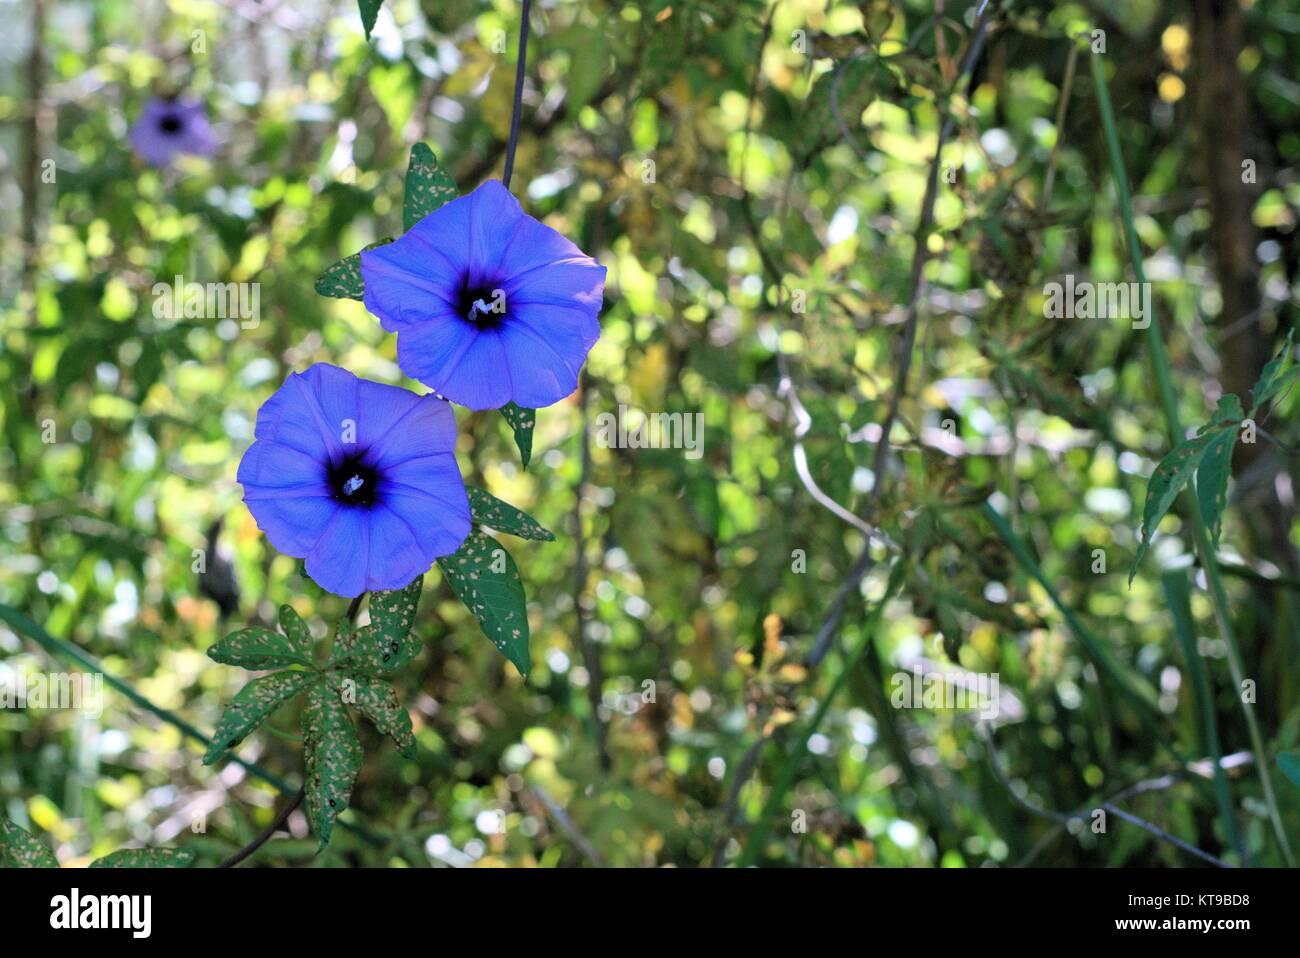 Purple flower weed found in australia and other tropical regions of purple flower weed found in australia and other tropical regions of the world mightylinksfo